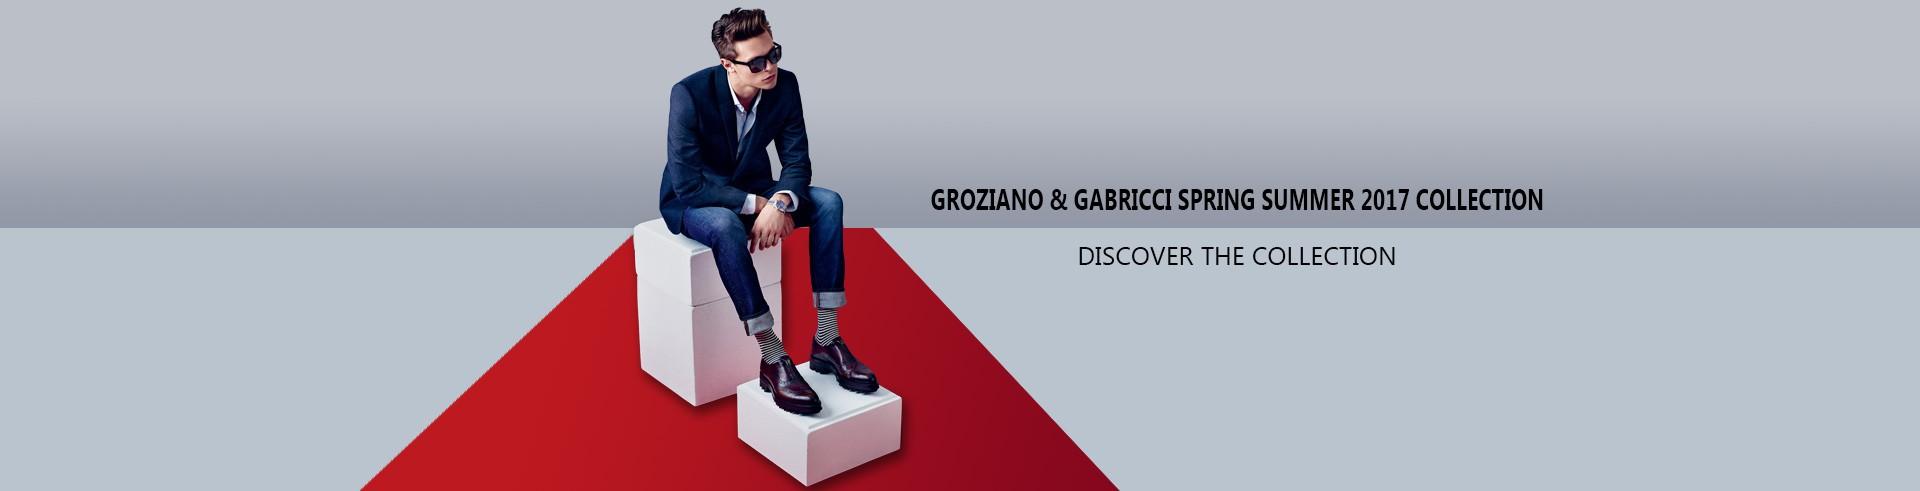 Groziano & Gabricci